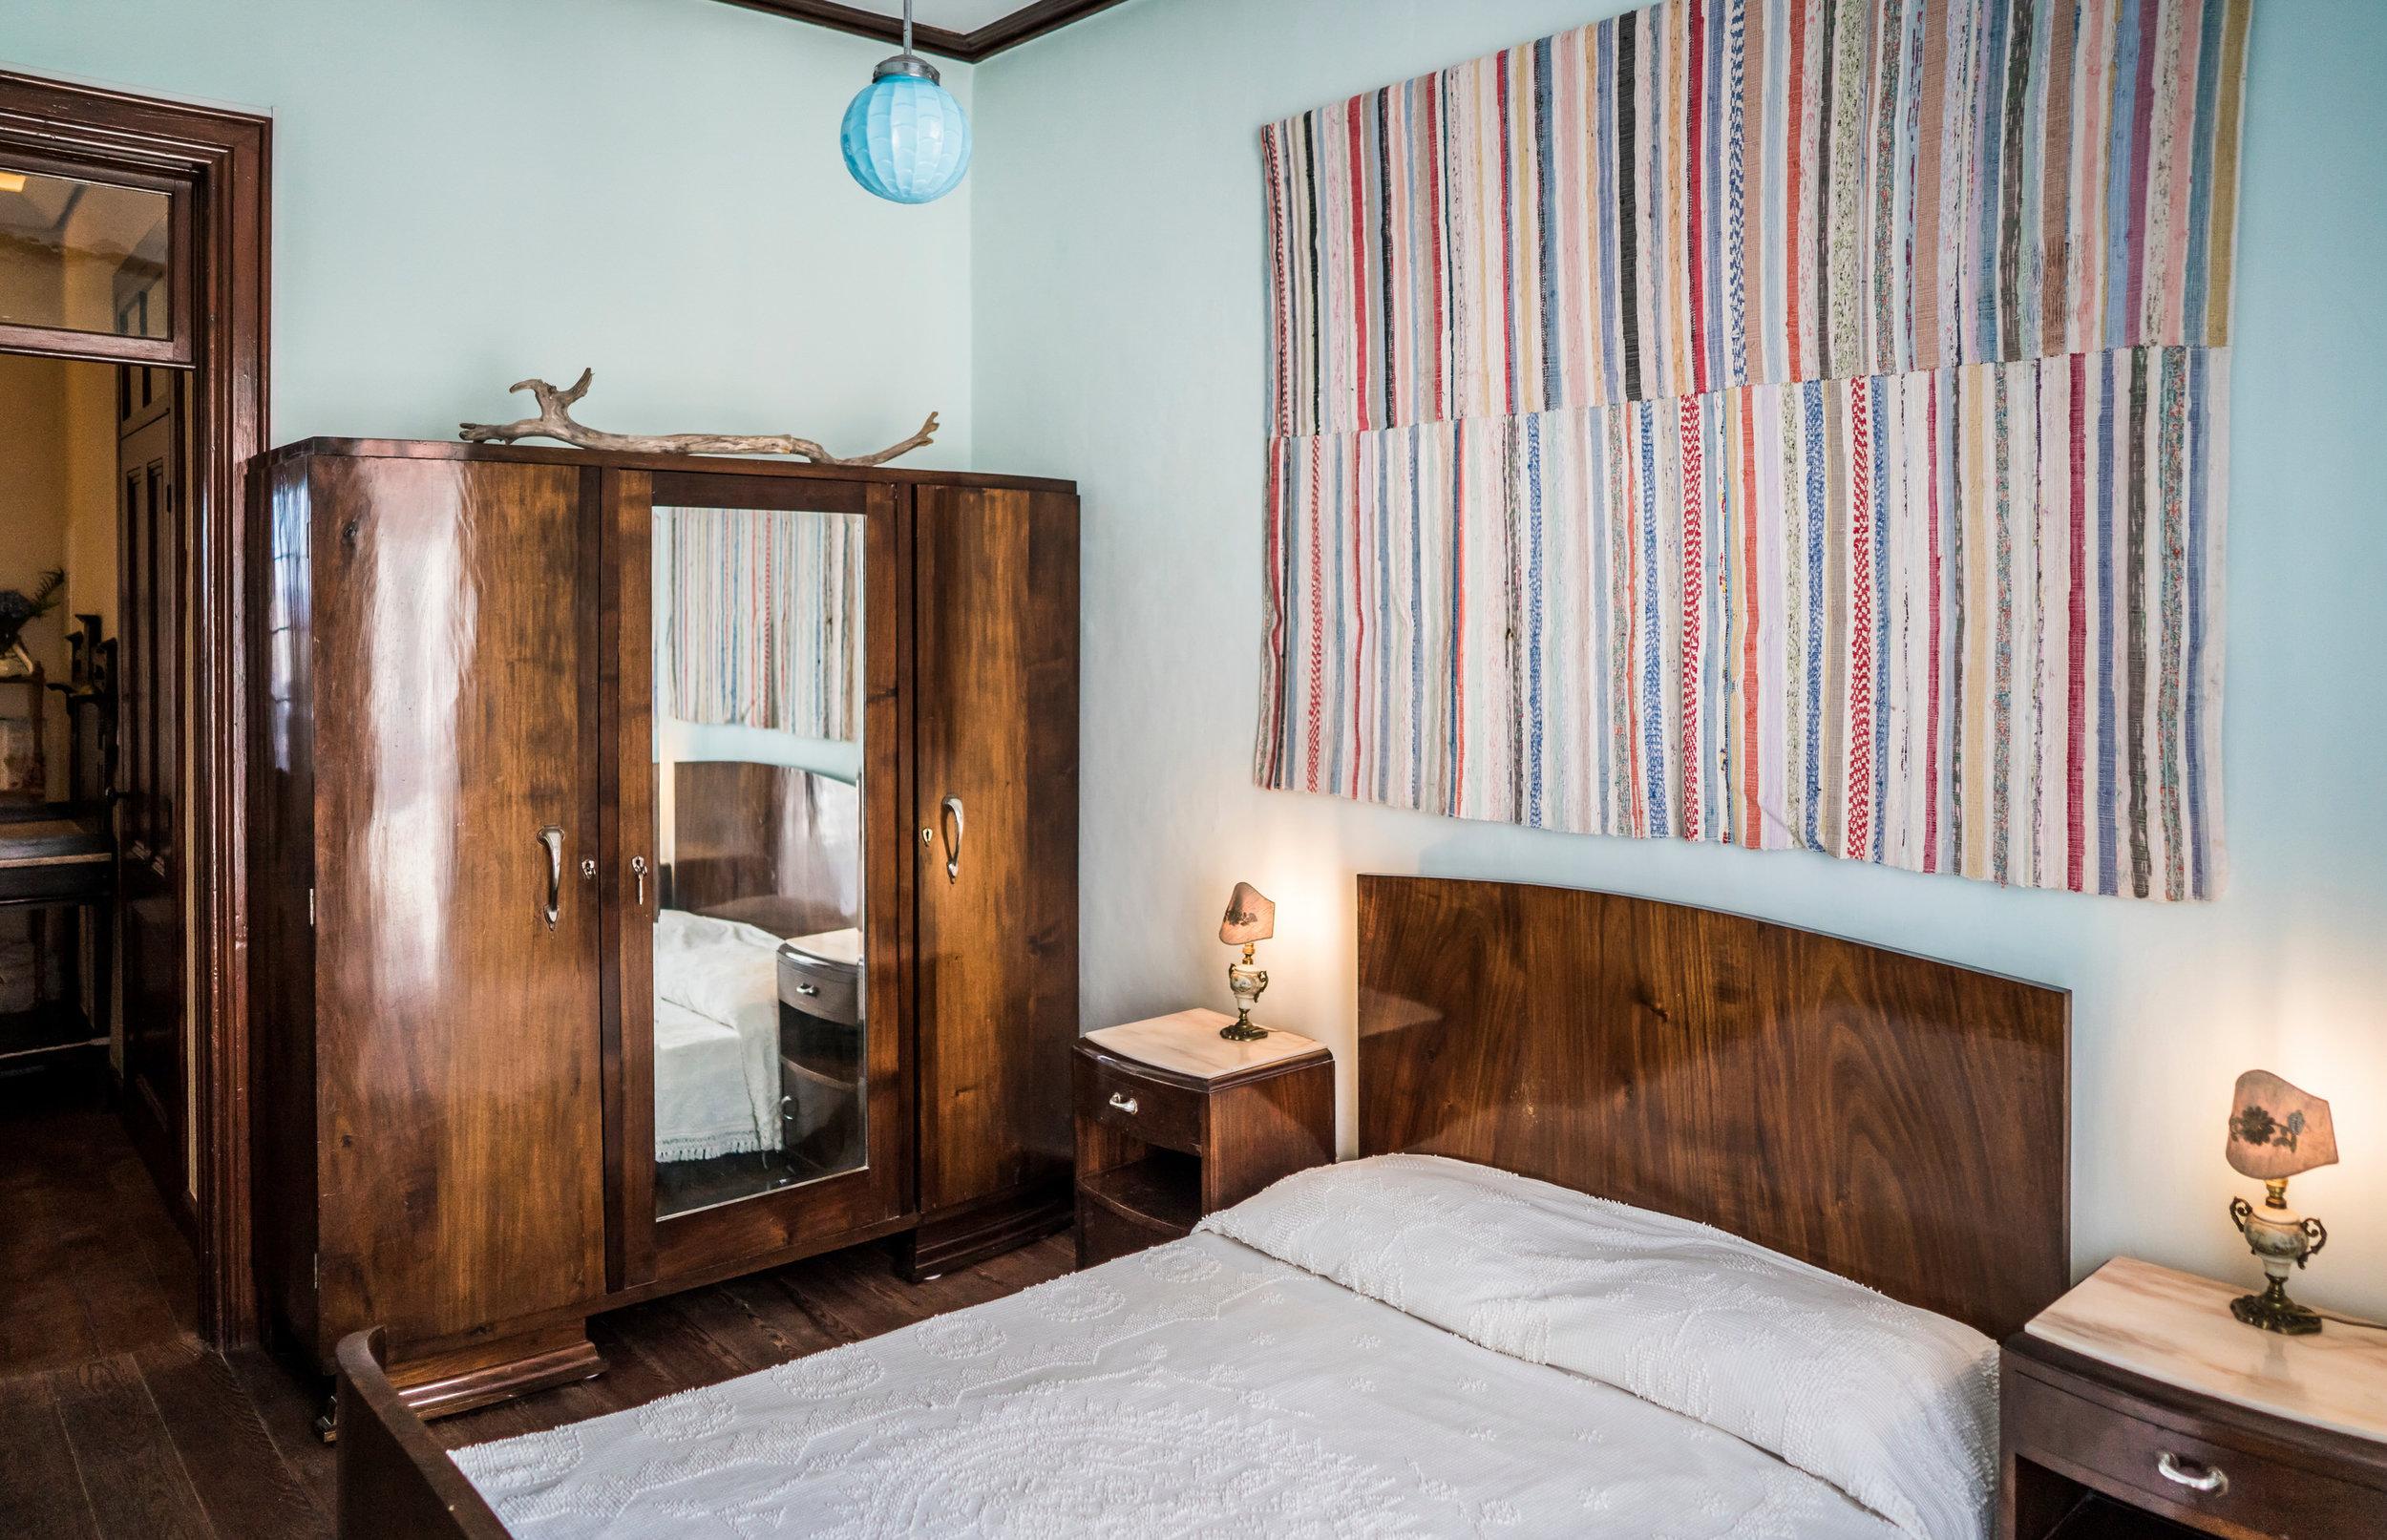 A village room at Quinta Oceania